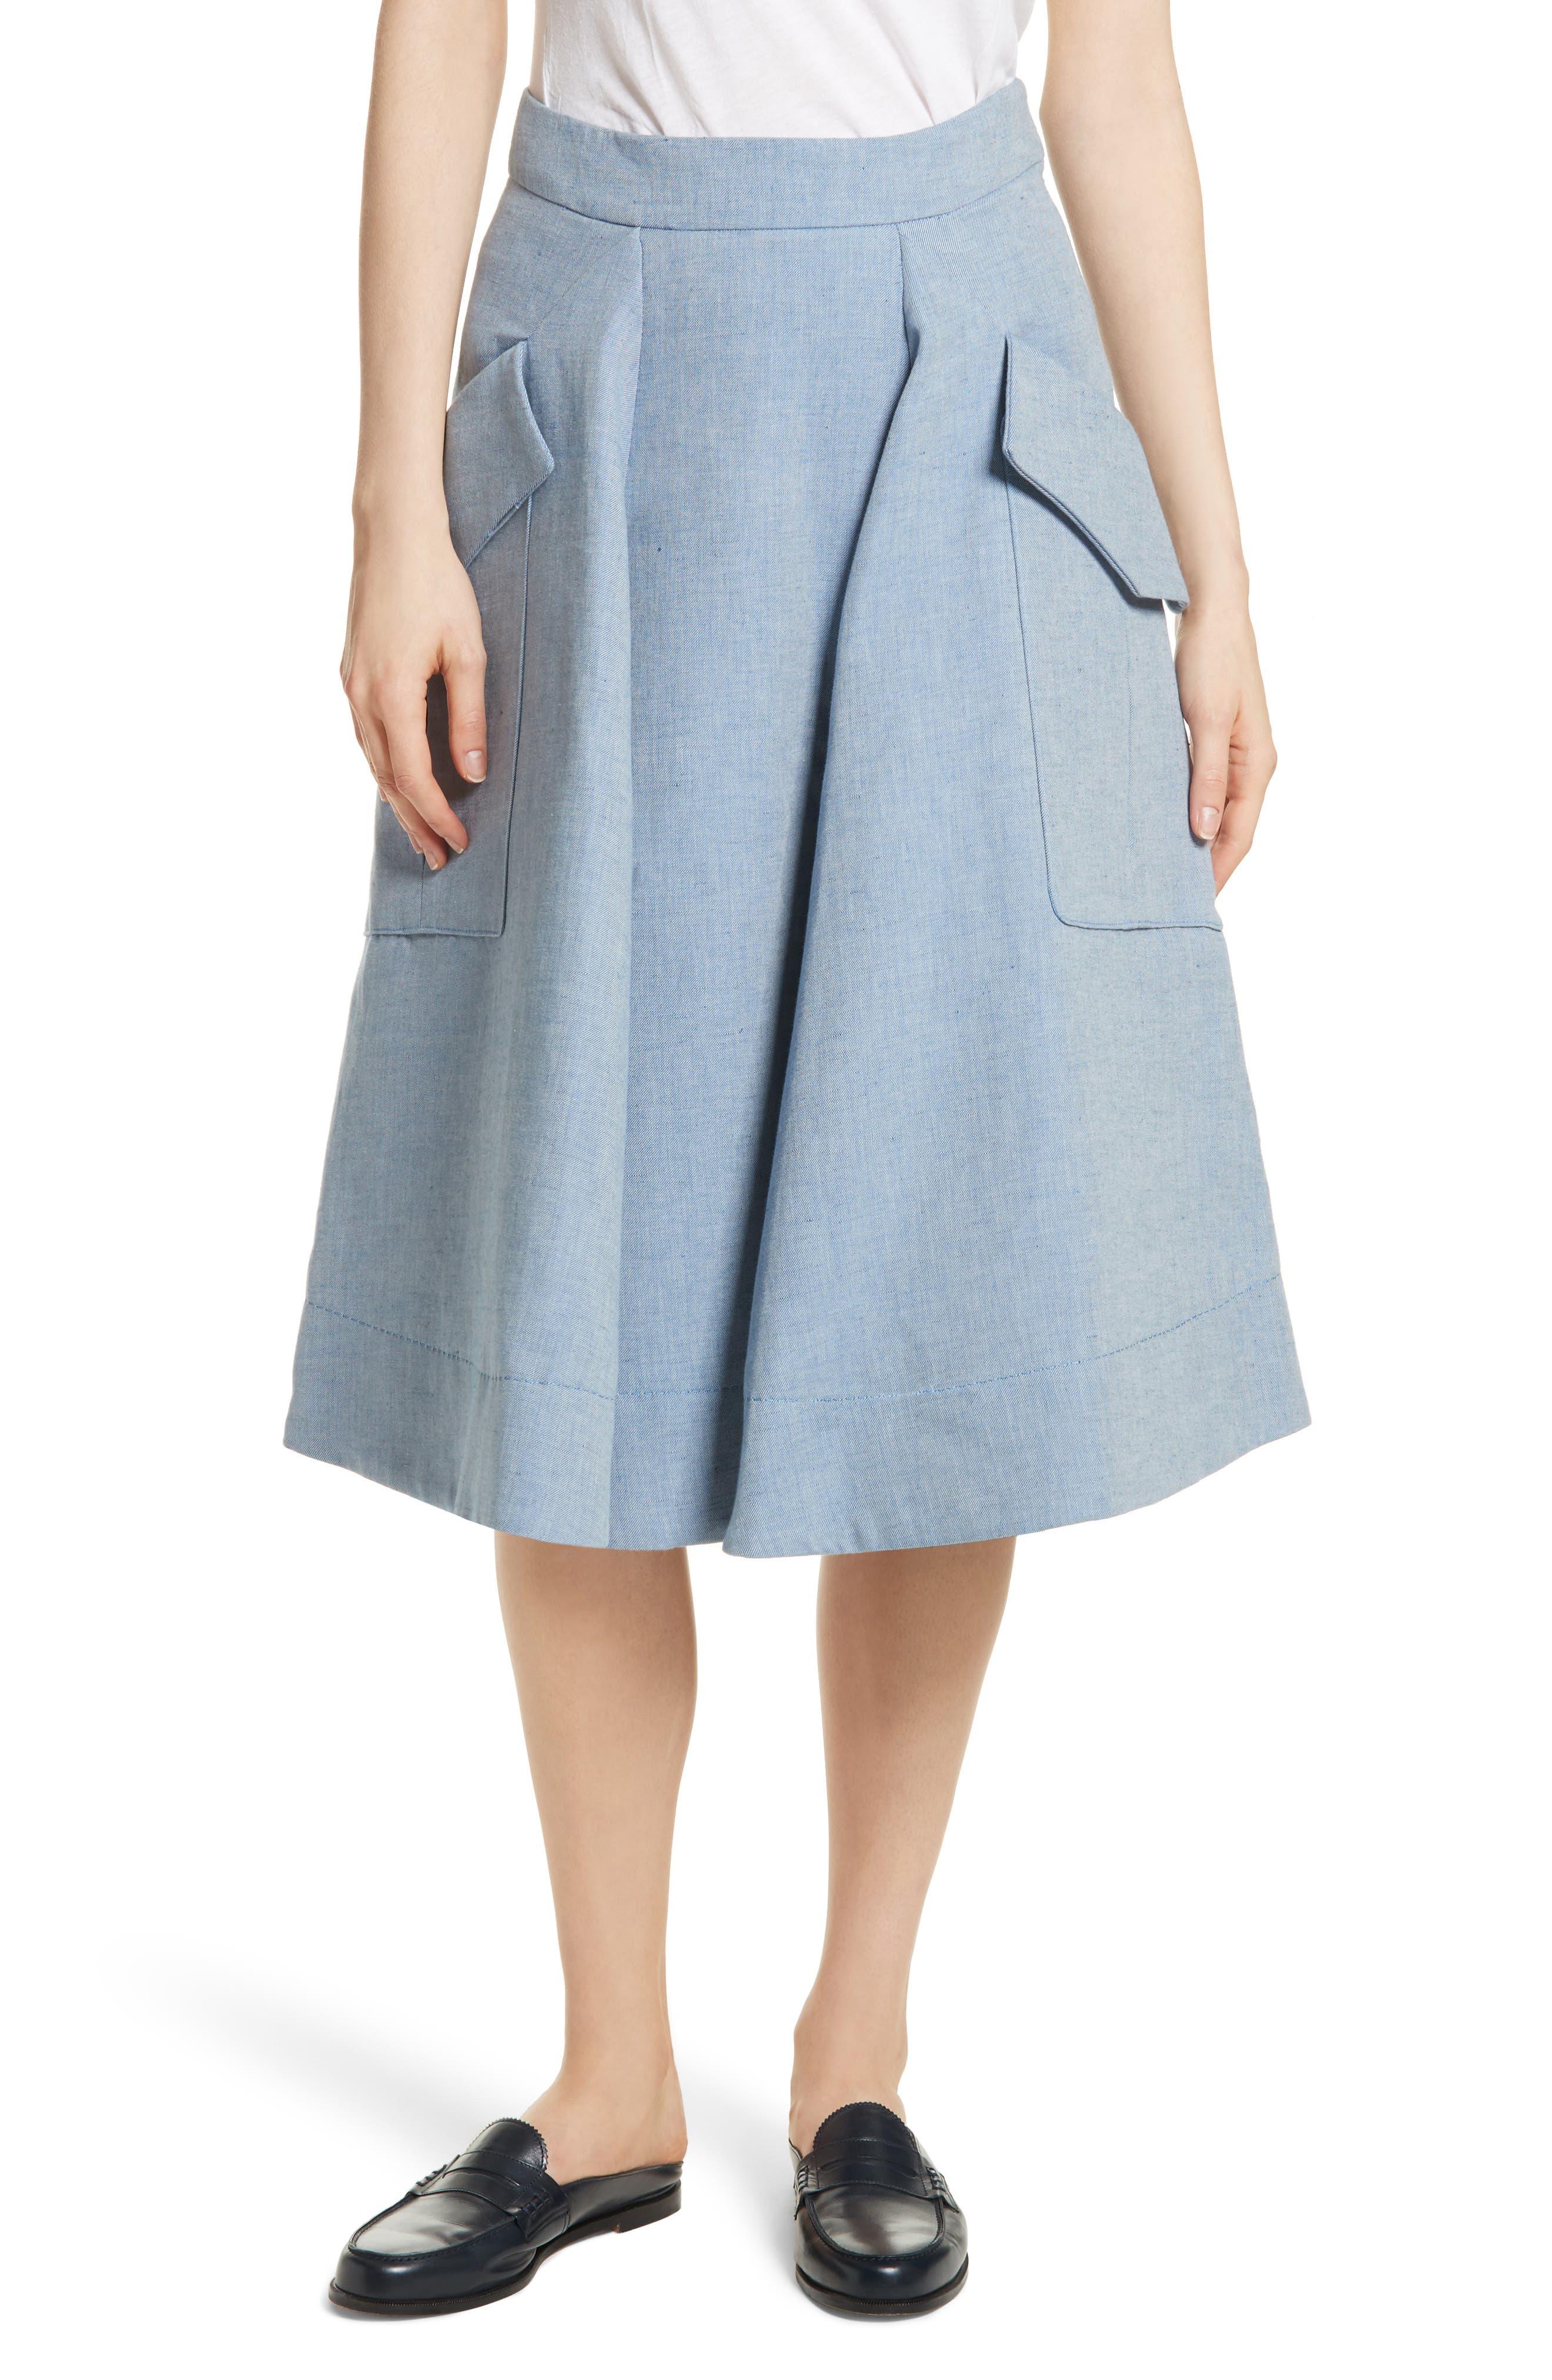 Jupe Genou Skirt,                             Main thumbnail 1, color,                             400